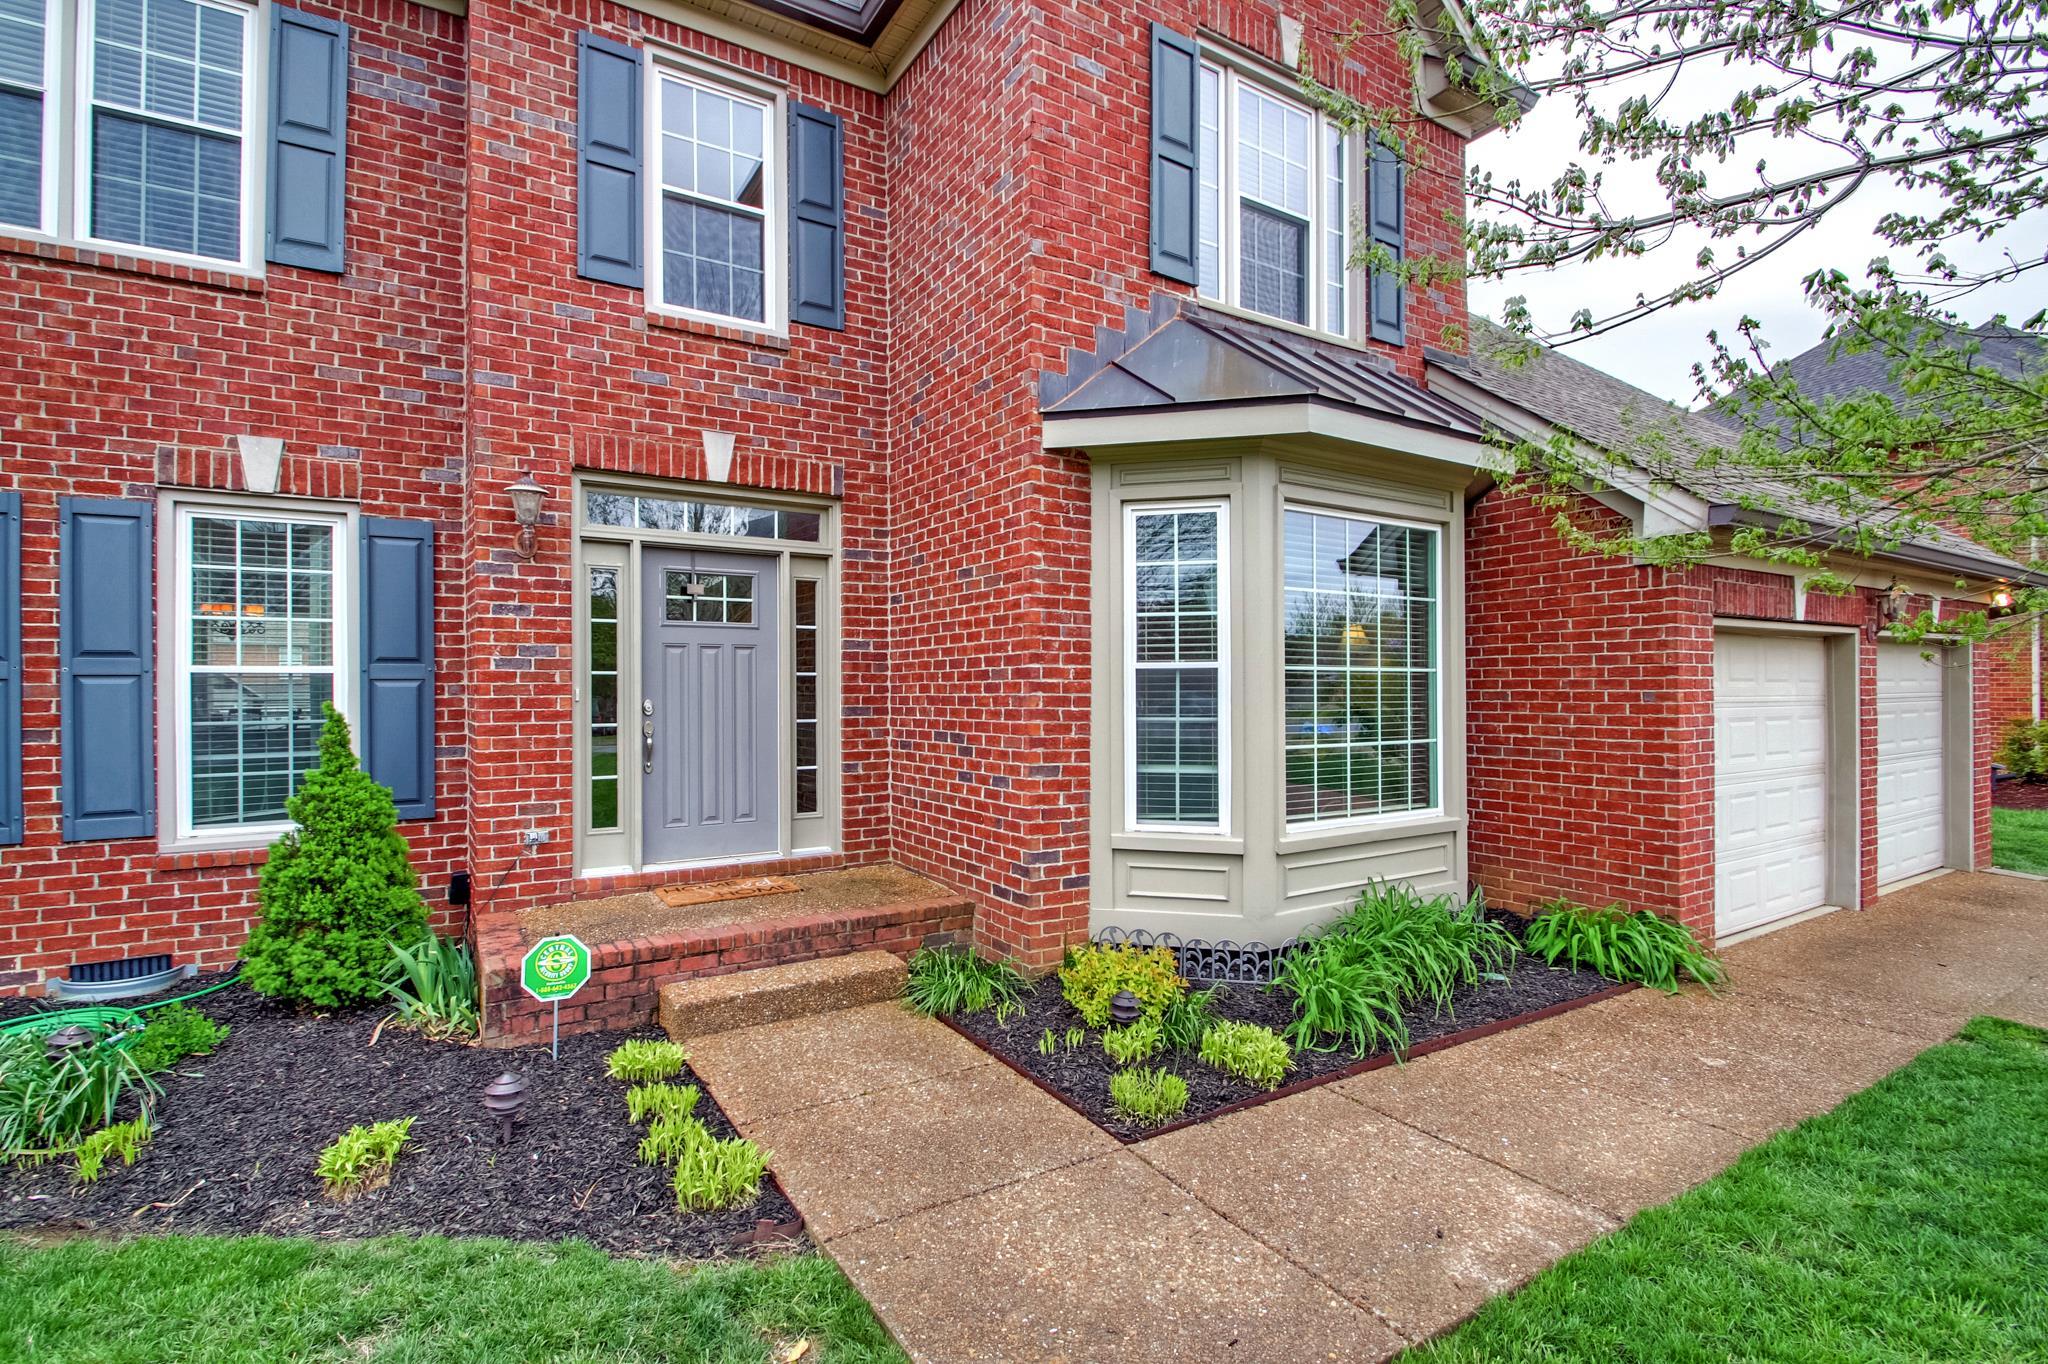 3126 Bush Drive, Franklin in Williamson County County, TN 37064 Home for Sale